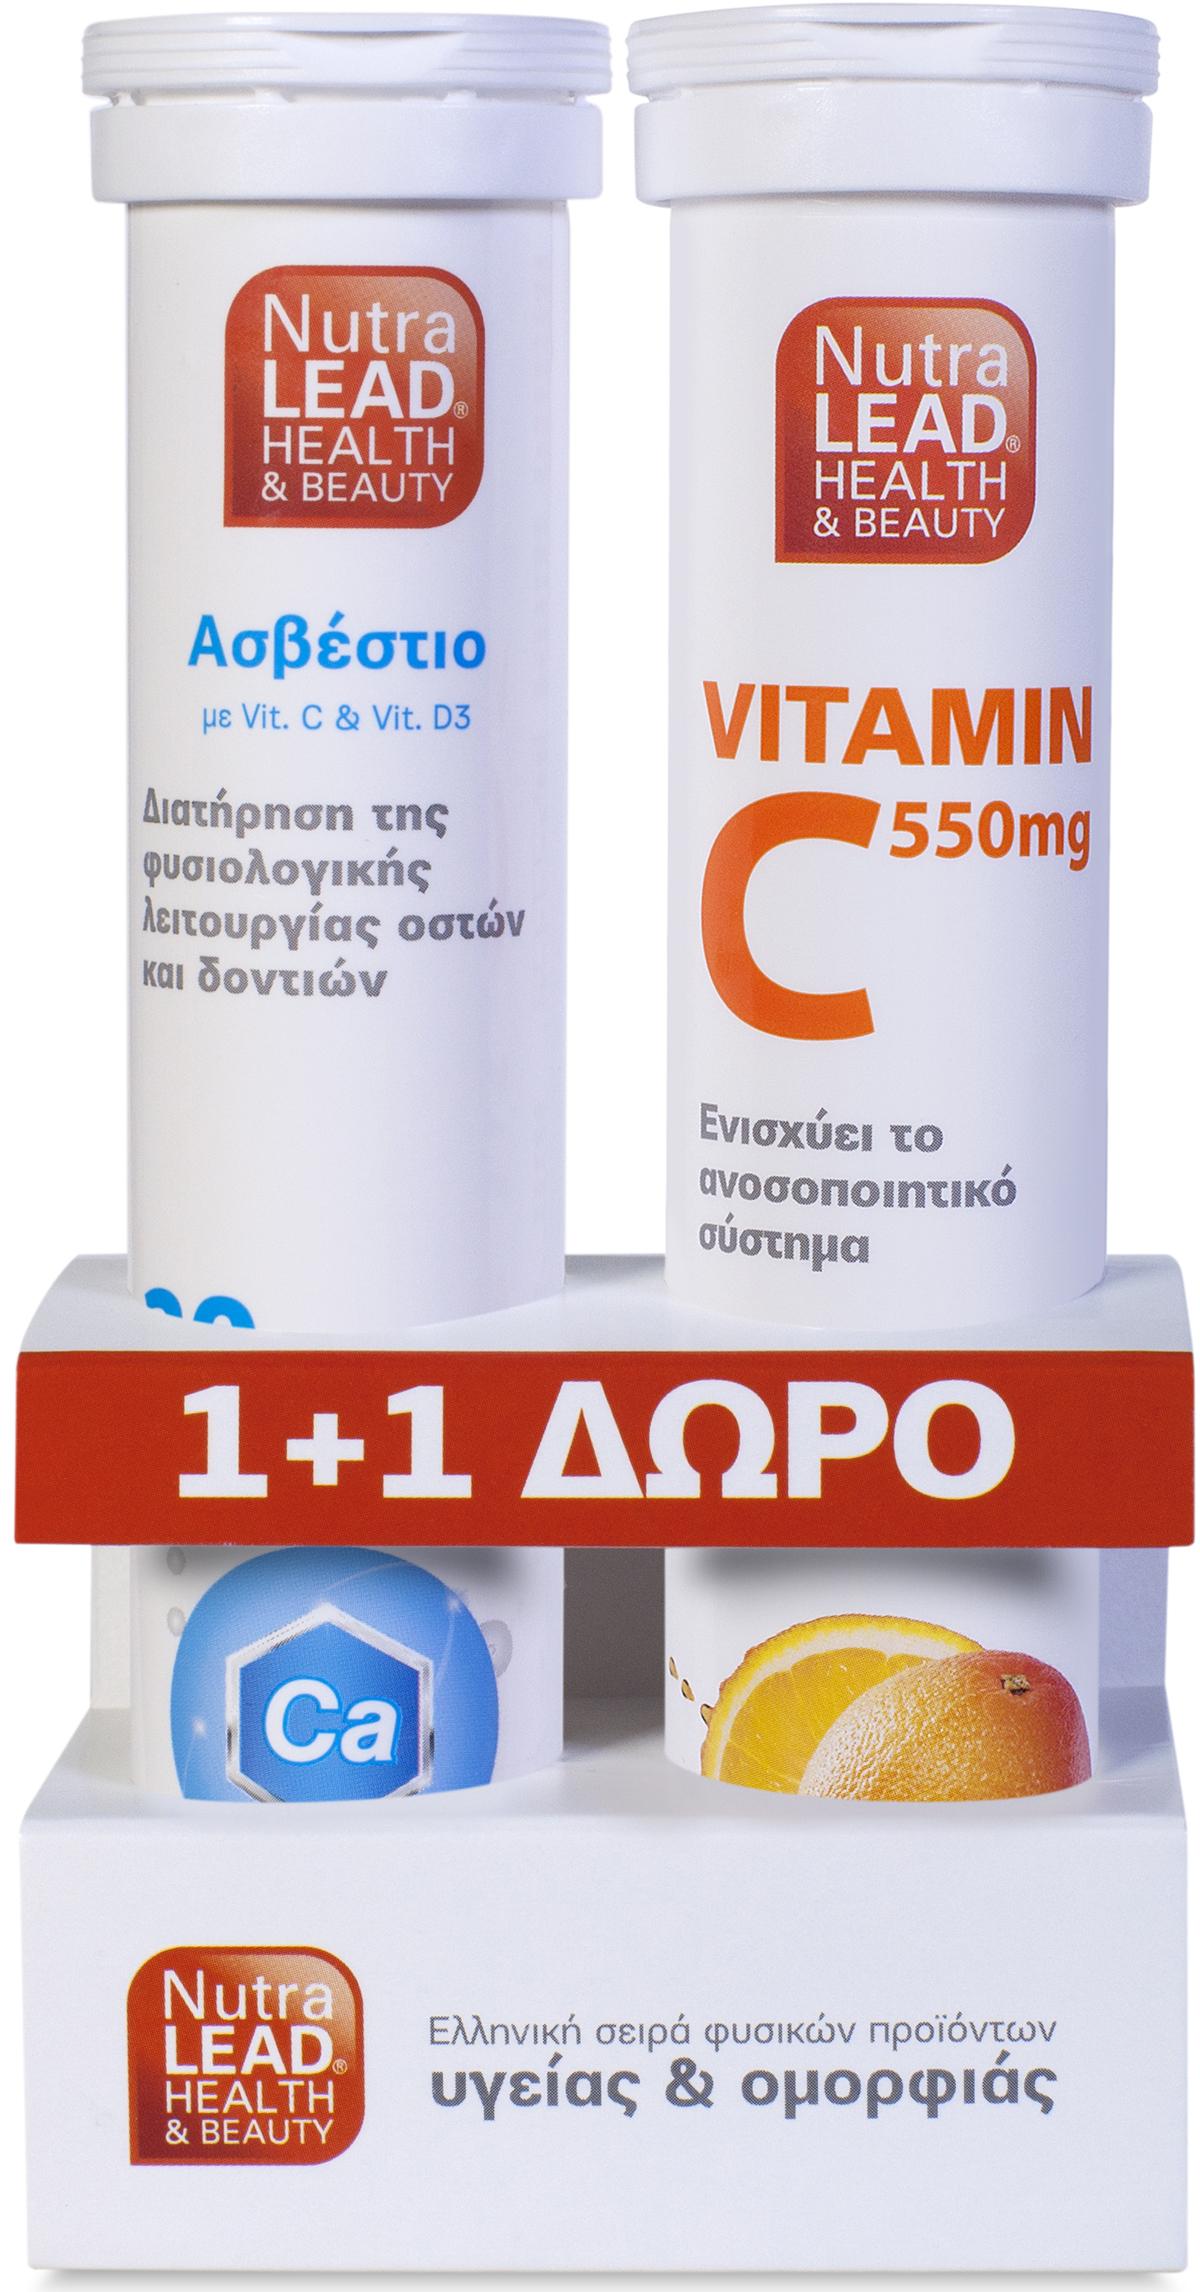 Nutralead Πακέτο Προσφοράς Ασβέστιο με Βιταμίνη C & Βιταμίνη D3 20Αναβρ.Δισκία + Βιταμίνη C 550mg – Πορτοκάλι 20Αναβρ.Δισκία